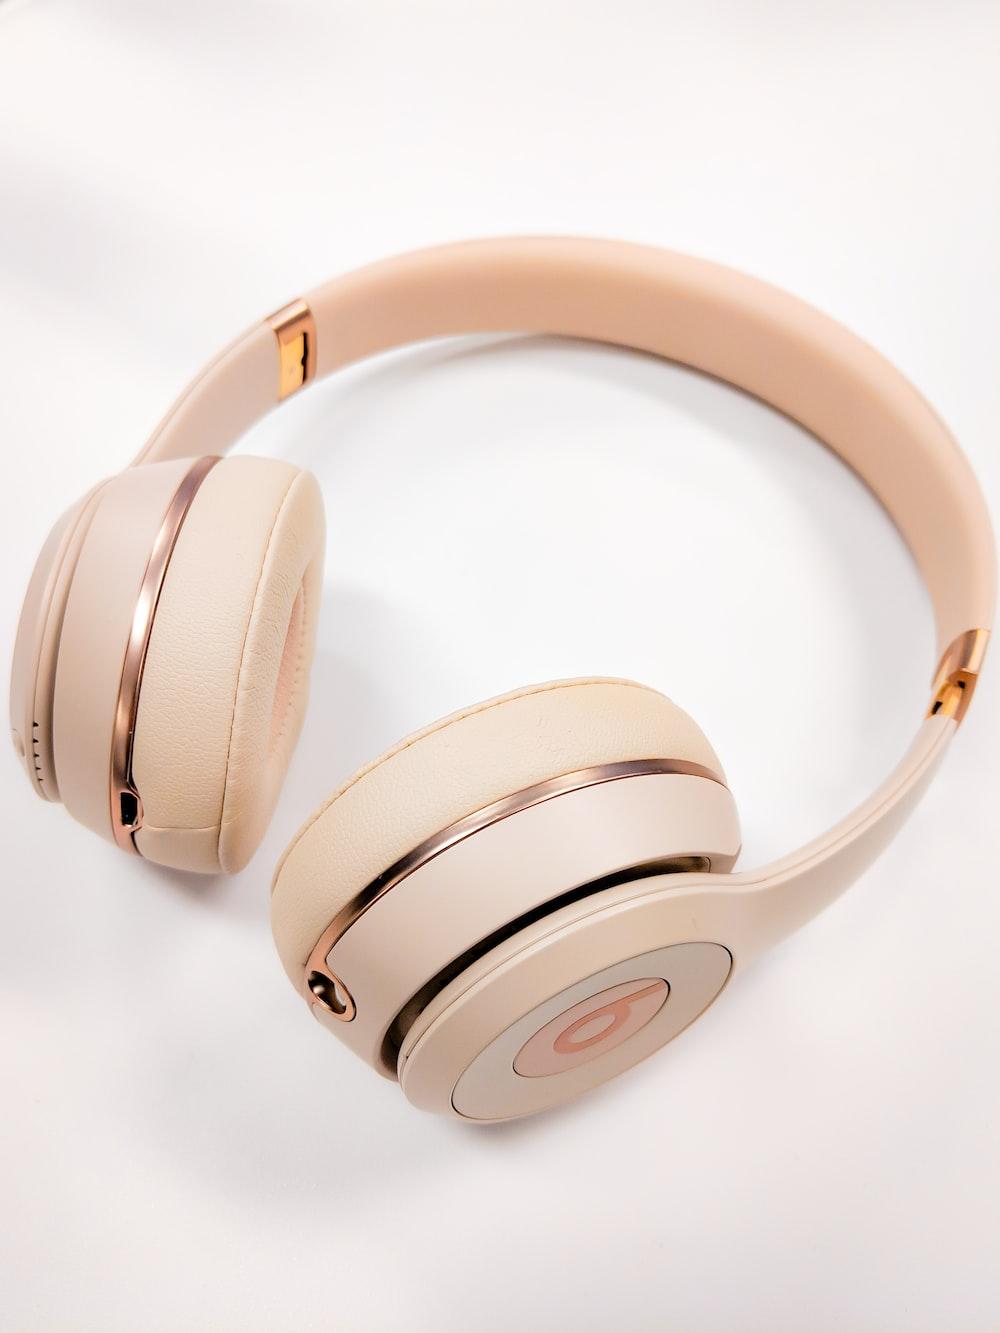 Gold Beats Wireless Headphones Photo Free Headphones Image On Unsplash